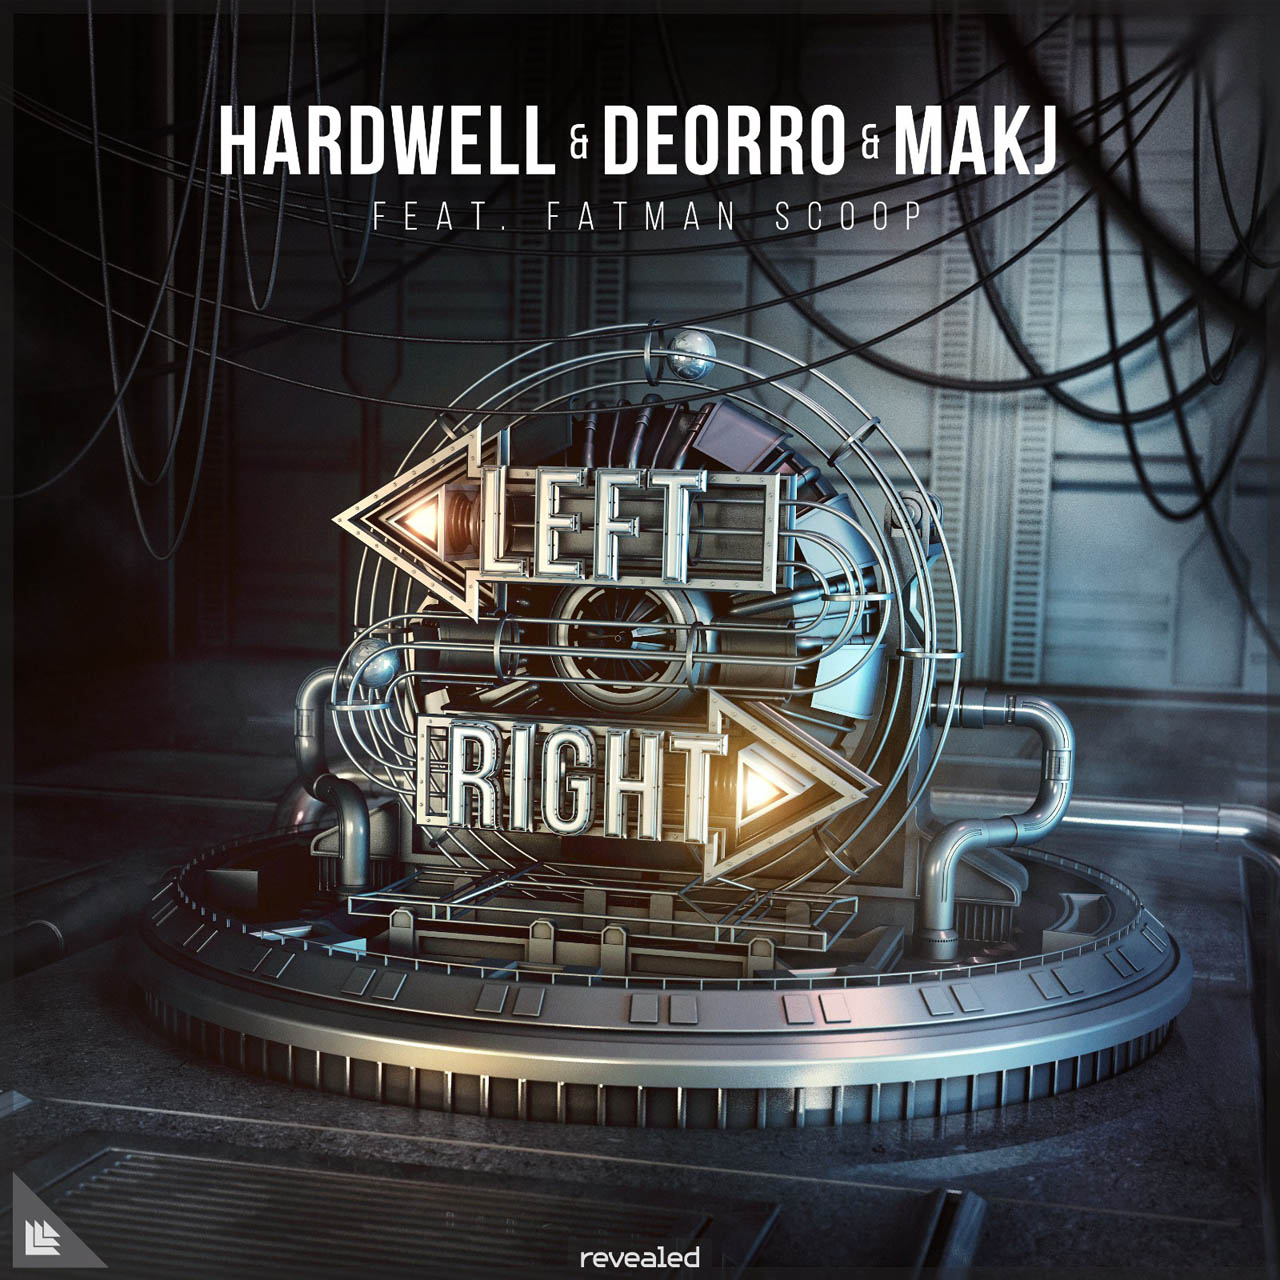 Hardwell Deorro Makj